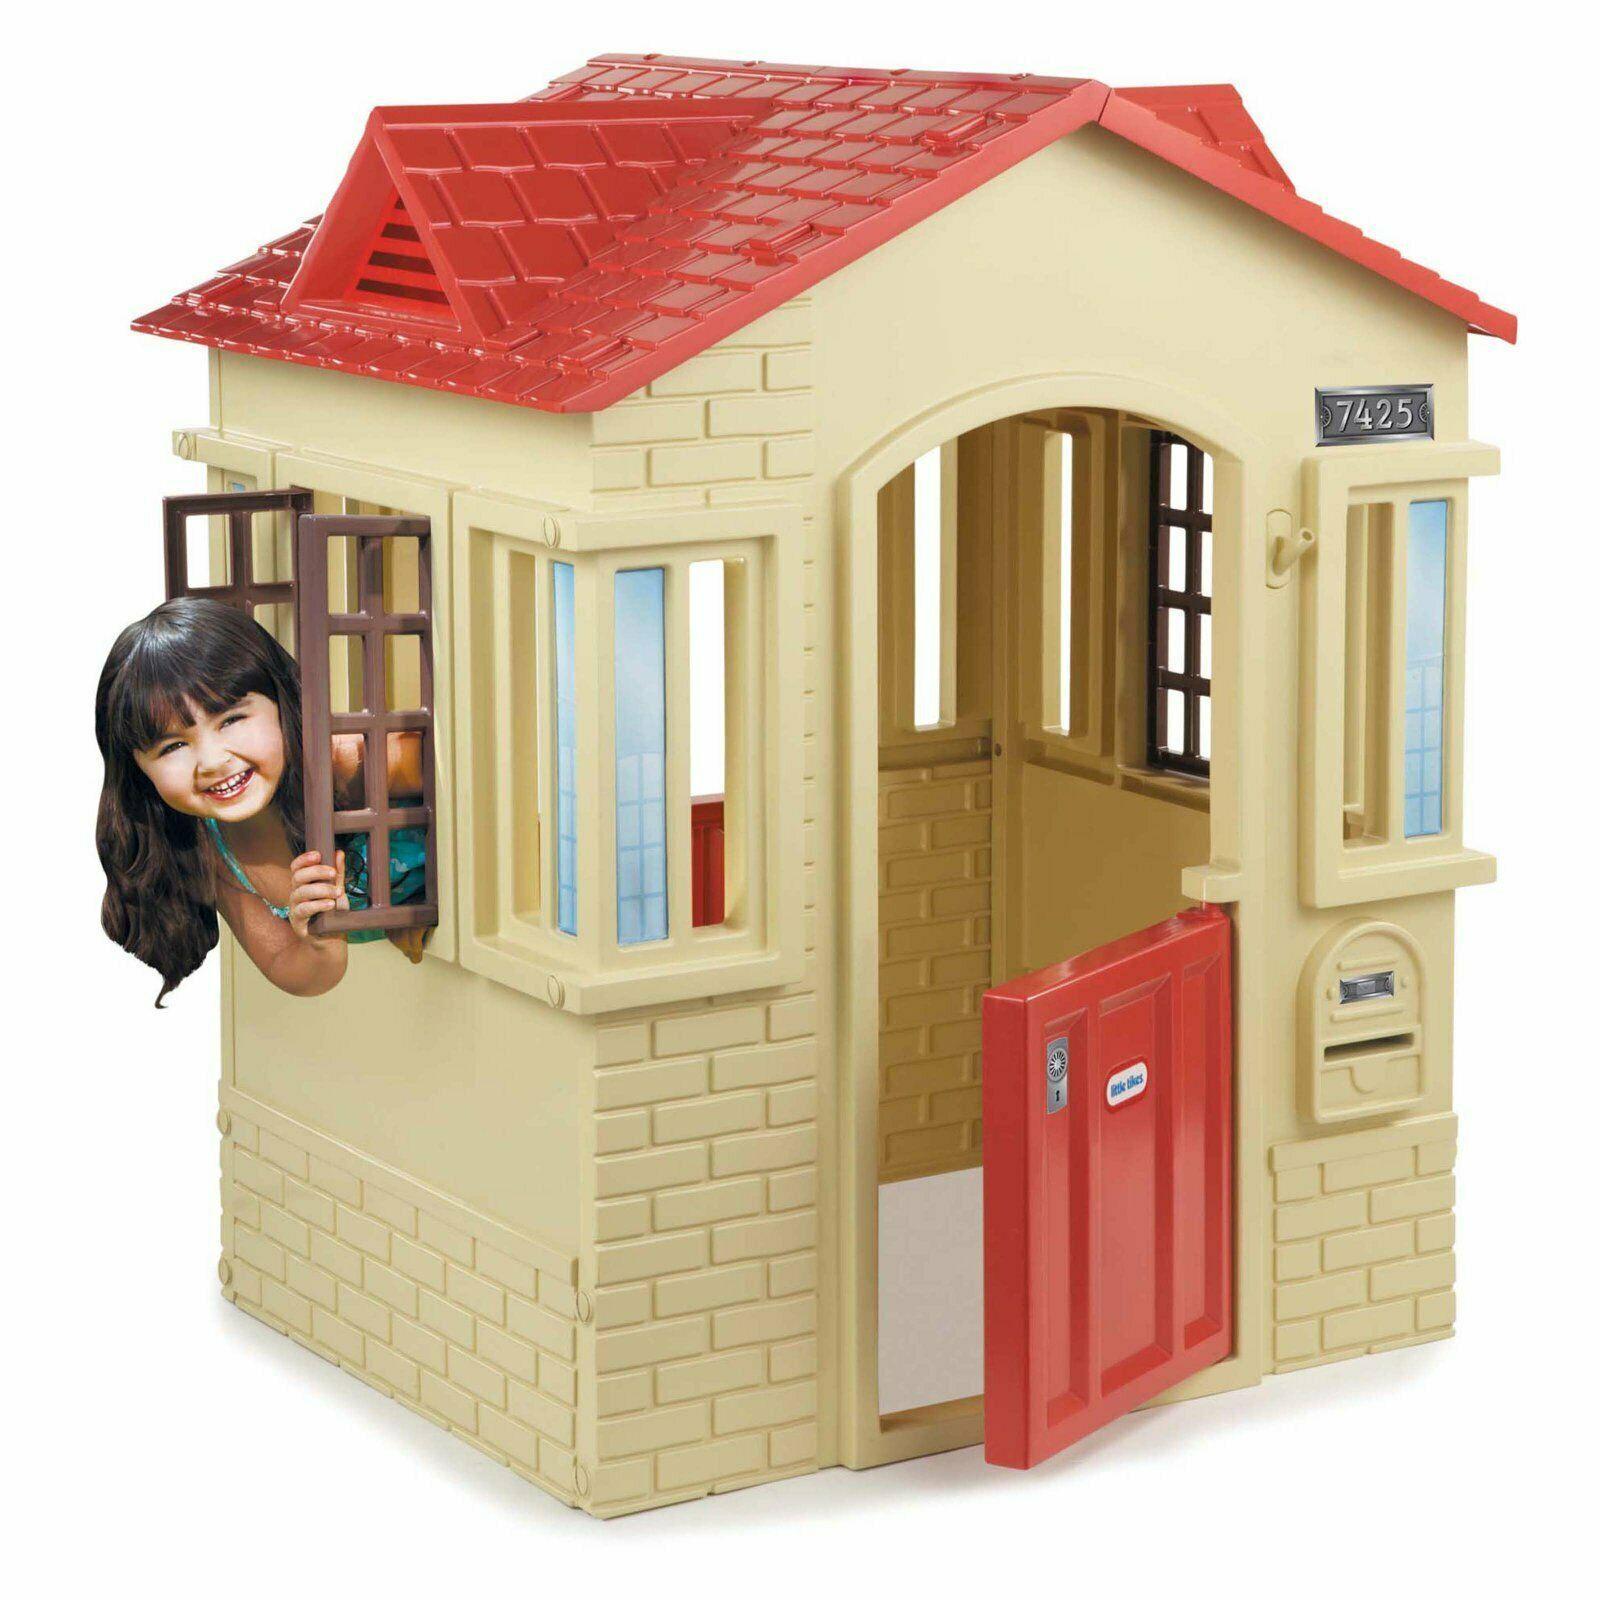 Little Tikes Cape Cottage Playhouse, Tan - $174.03